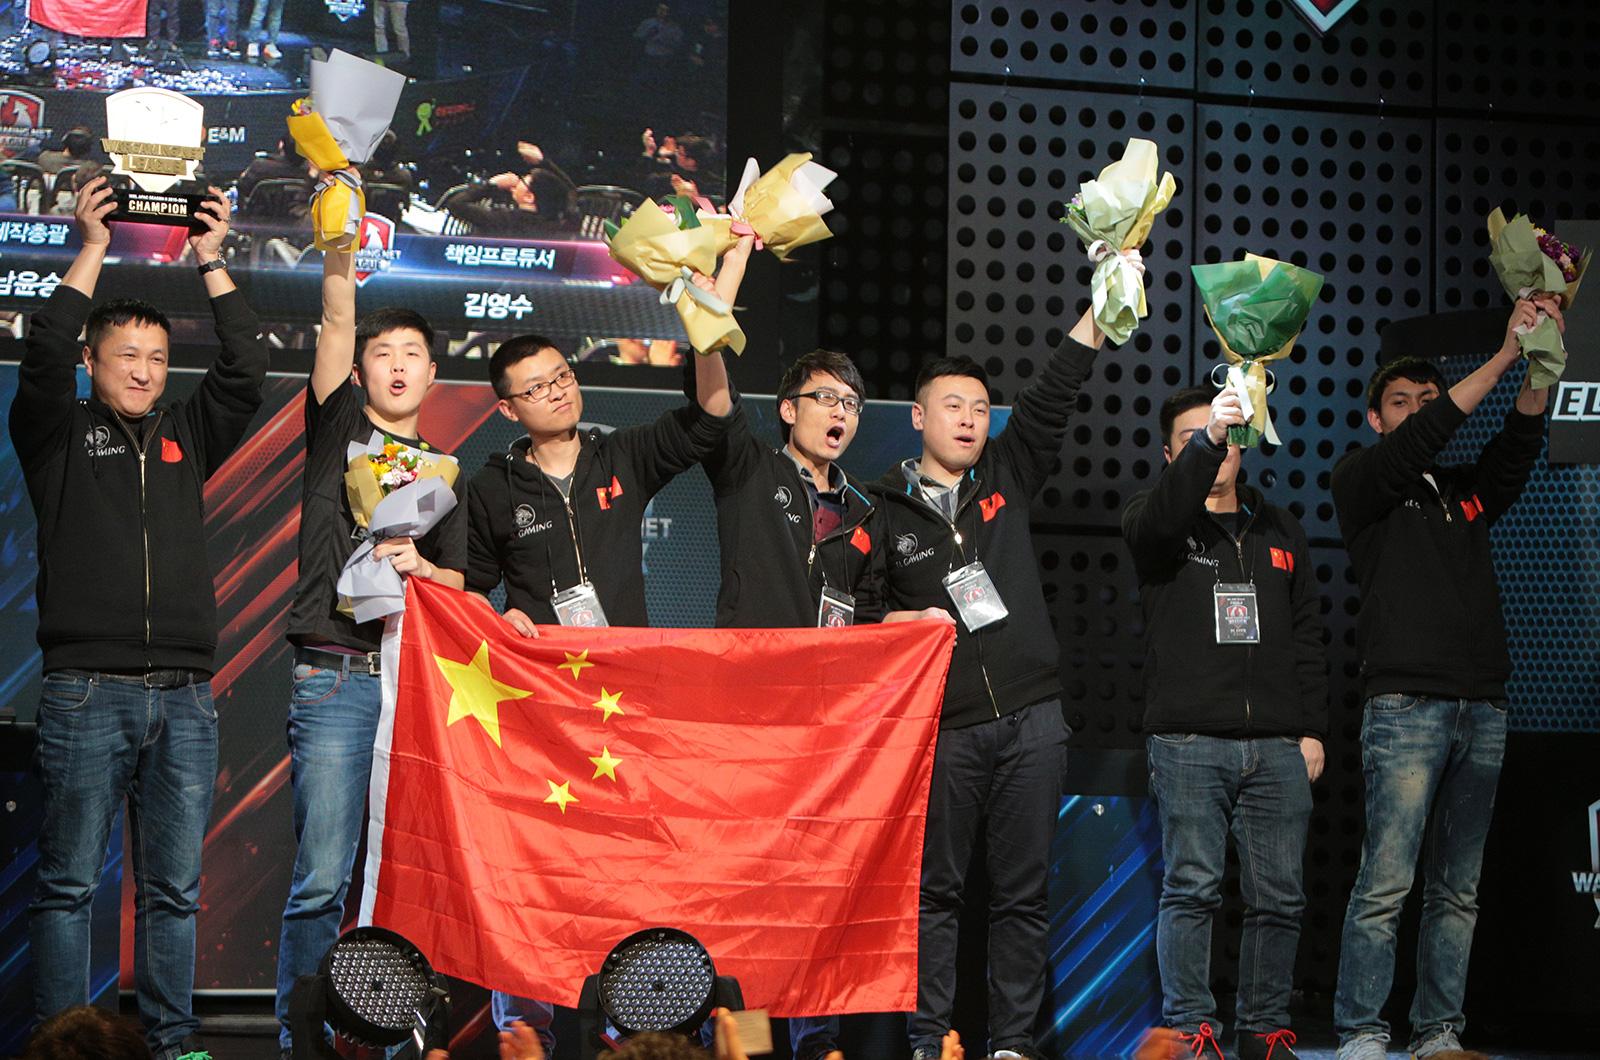 EL Gaming taking Champions